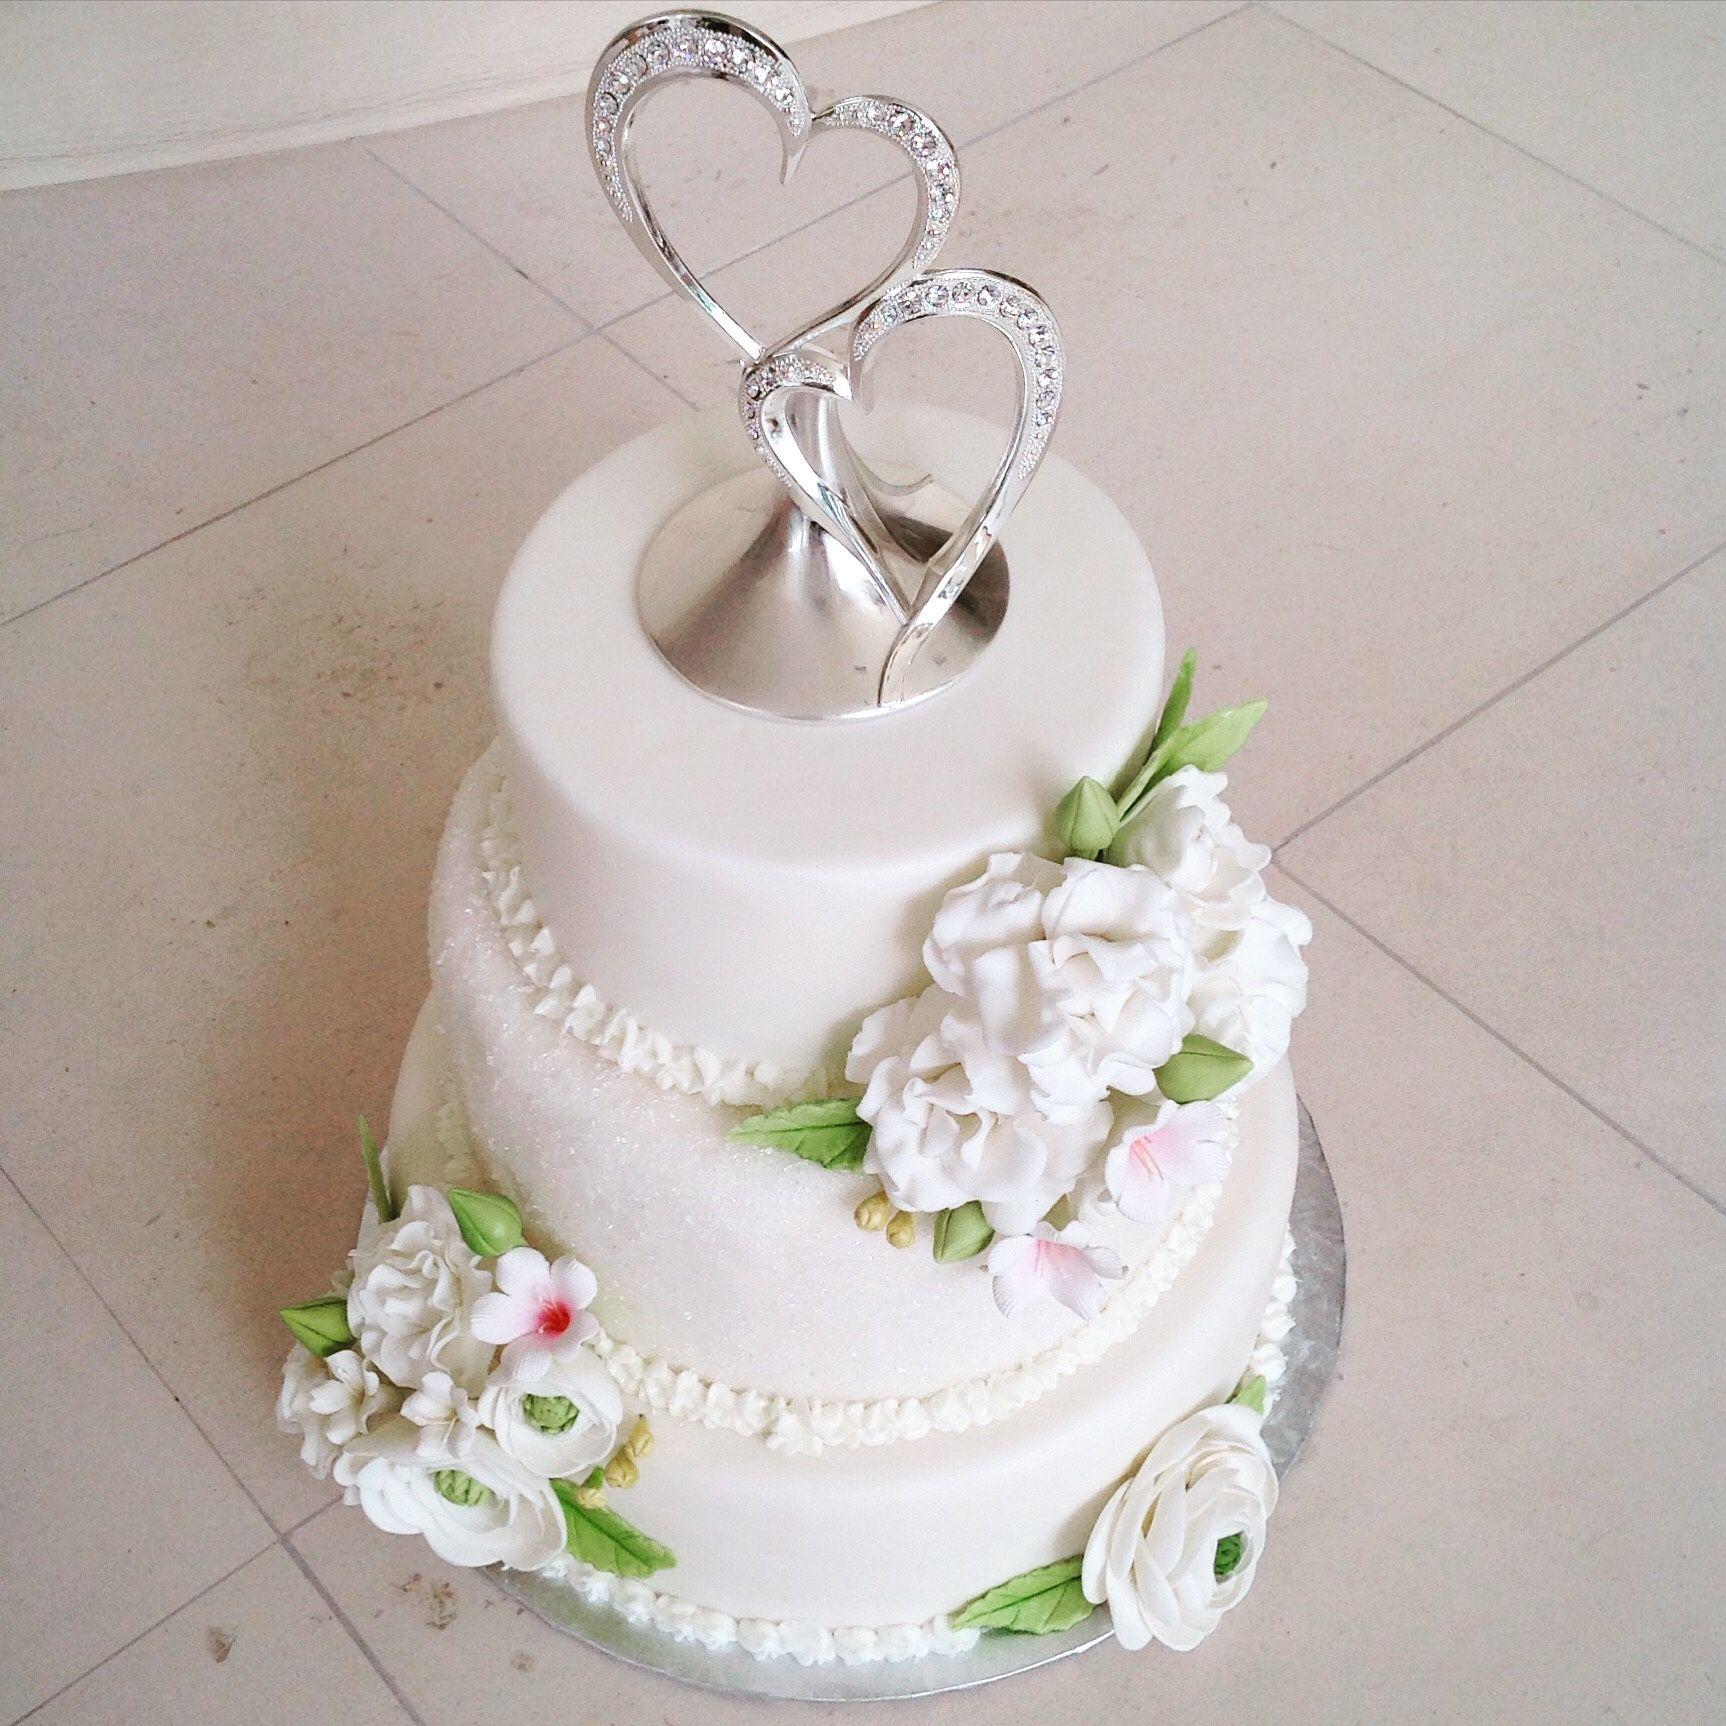 Stunning 3 tier wedding cake with handmade sugar flowers | Suga-Rush ...